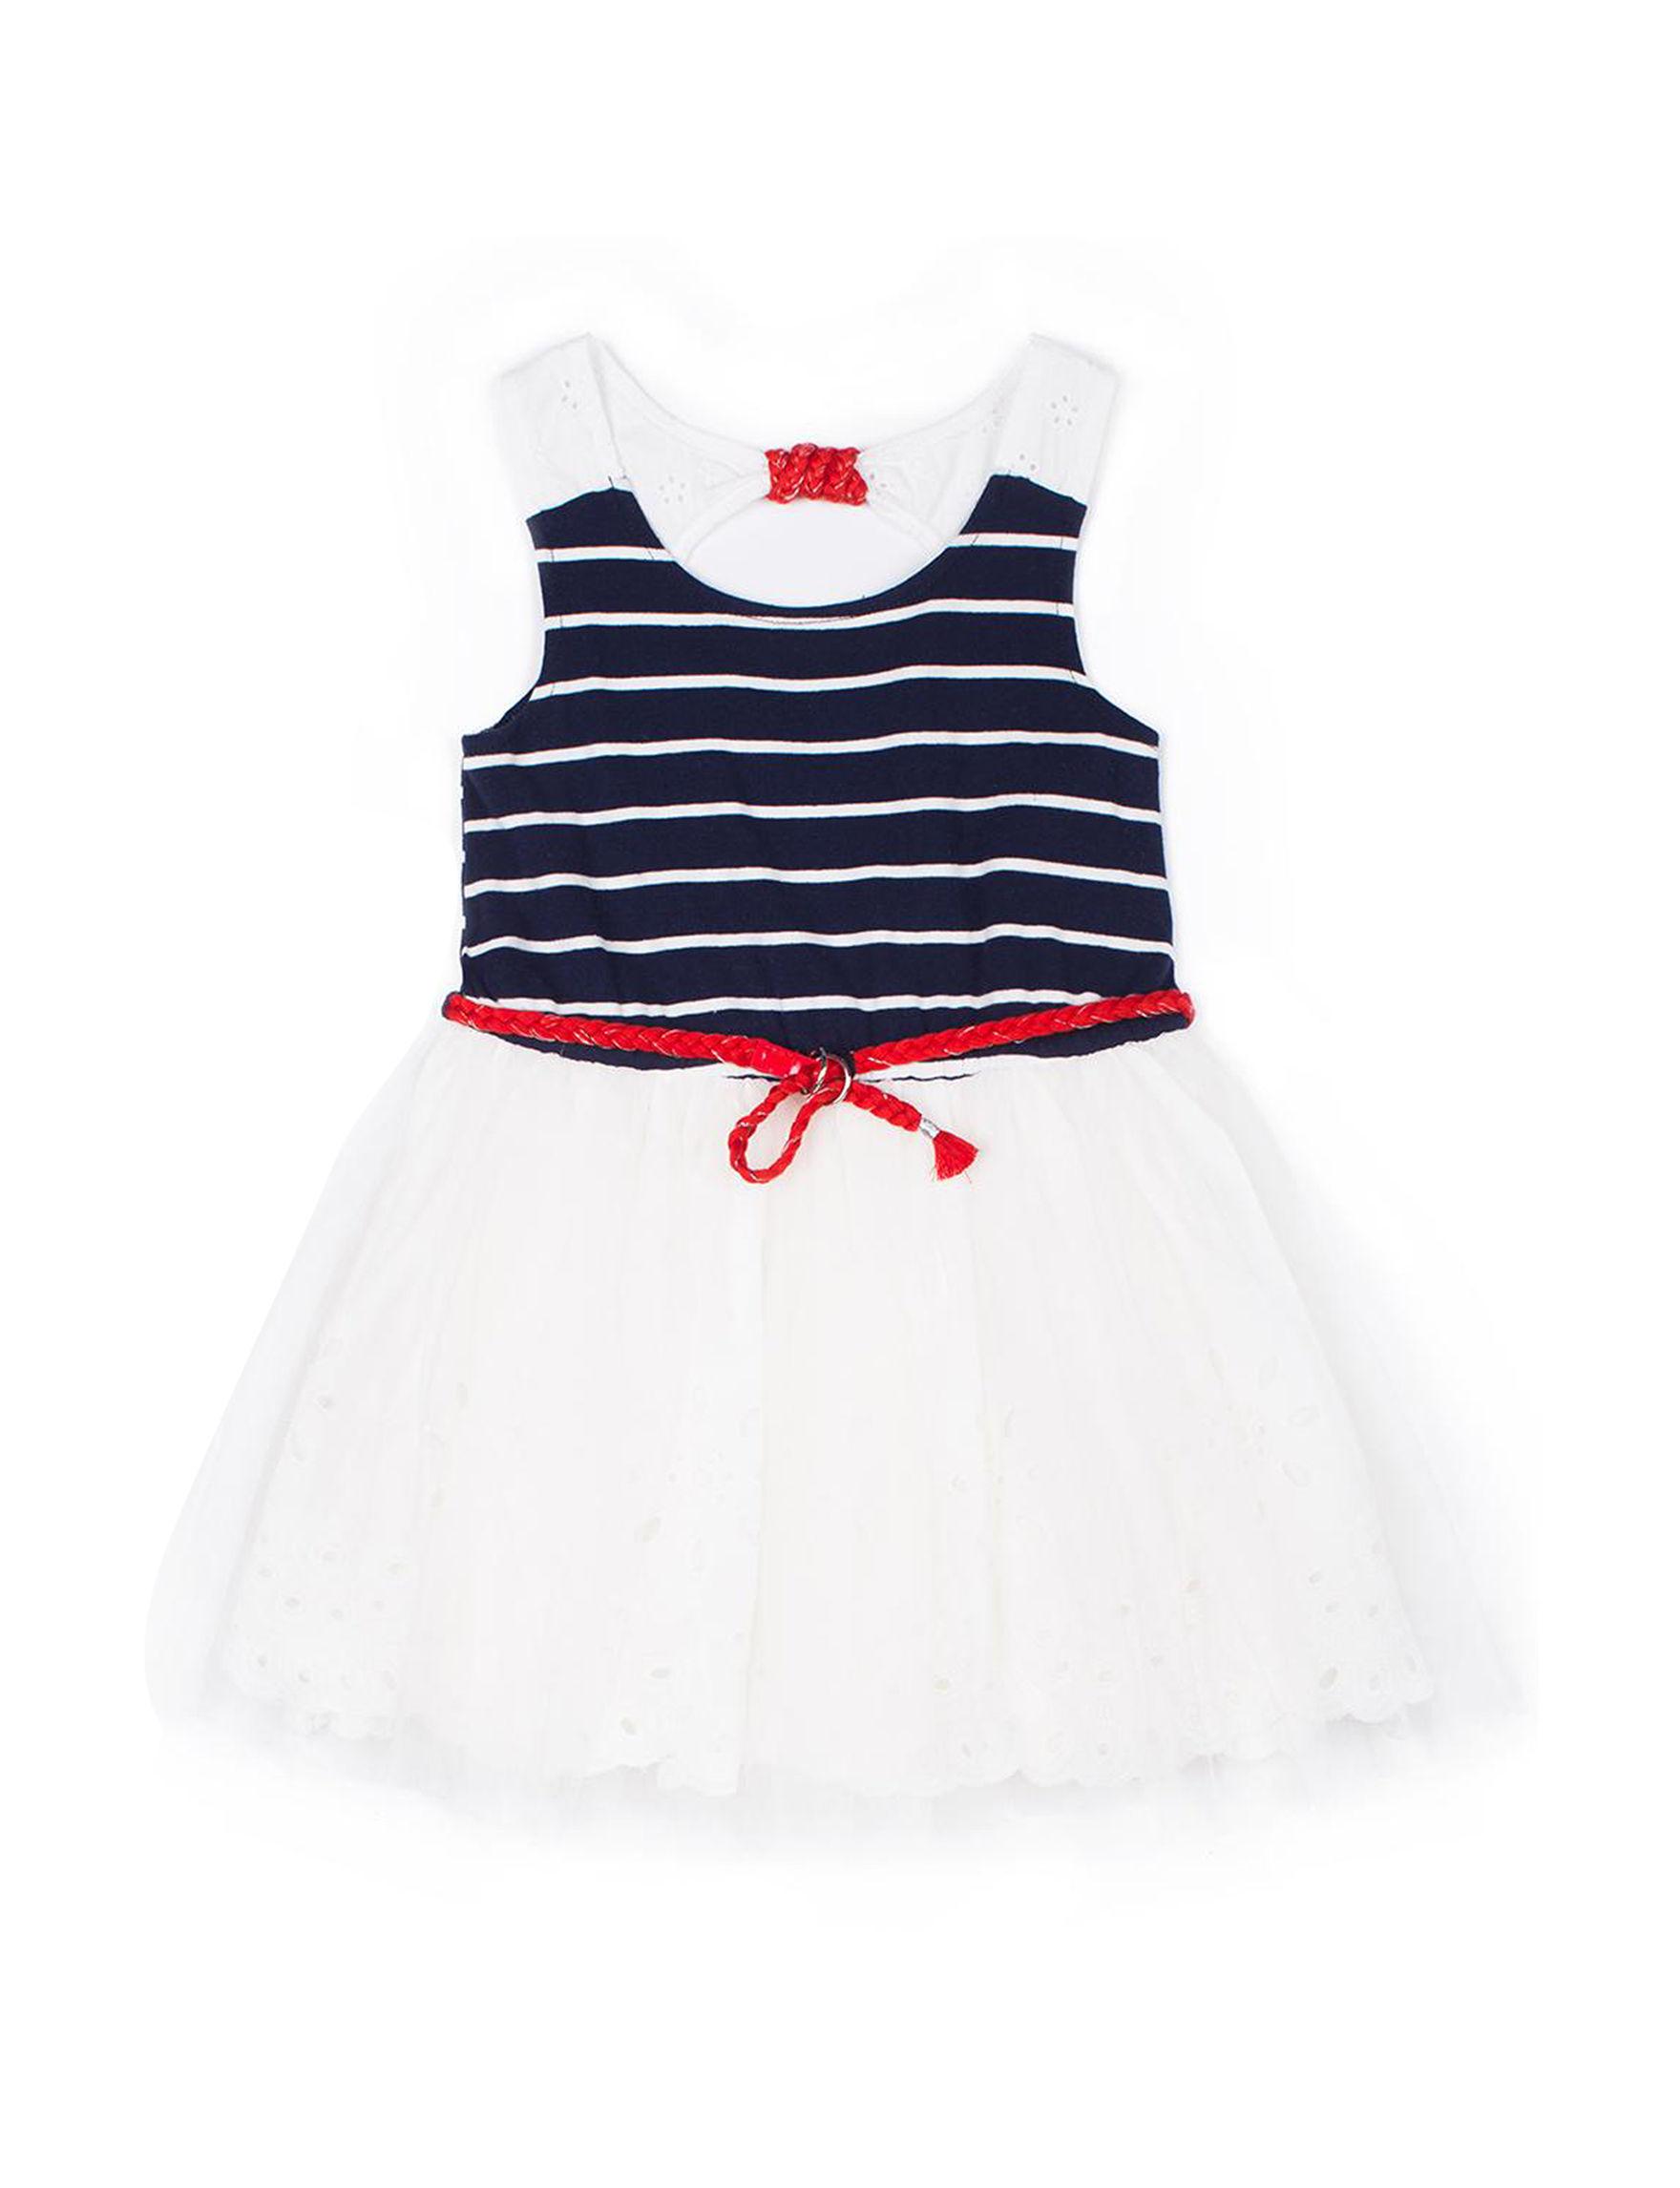 Little Lass White / Navy